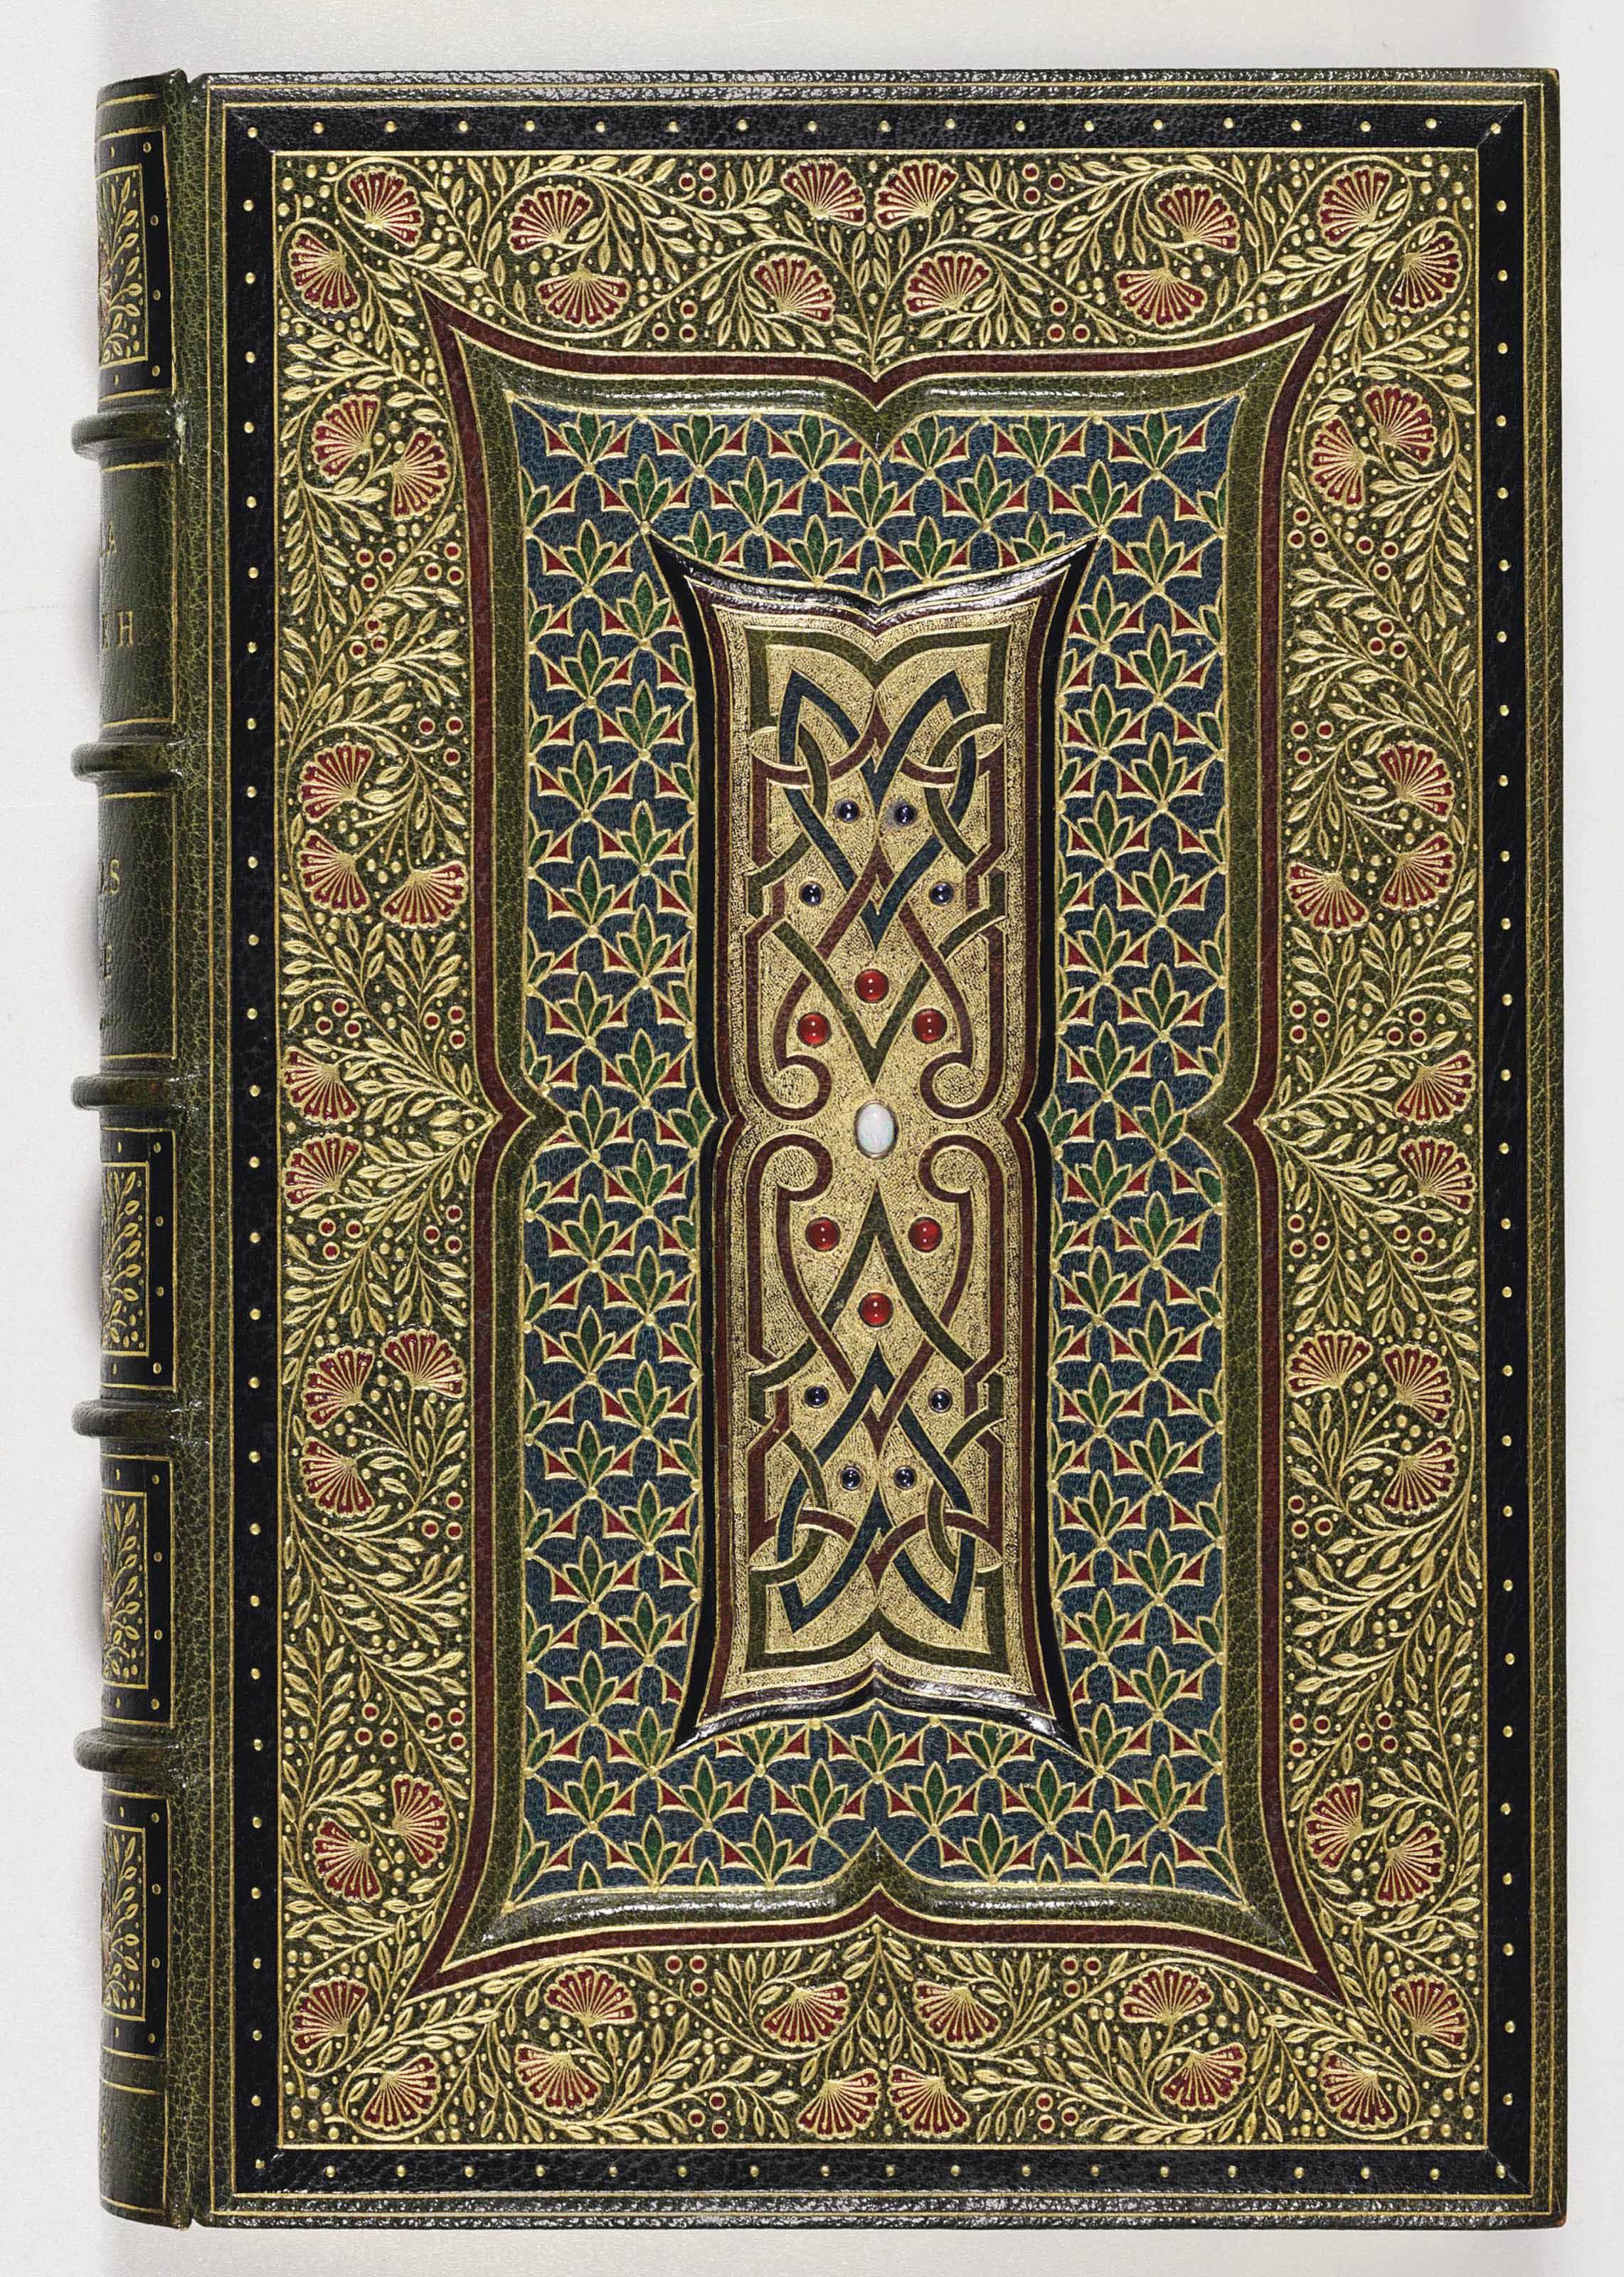 [BINDING--SANGORSKI and SUTCLIFFE, binders].  MOORE, Thomas. Lalla Rookh, an Oriental Romance New Edition.  London: Longman, Brown, Green, and Longmans, 1846.